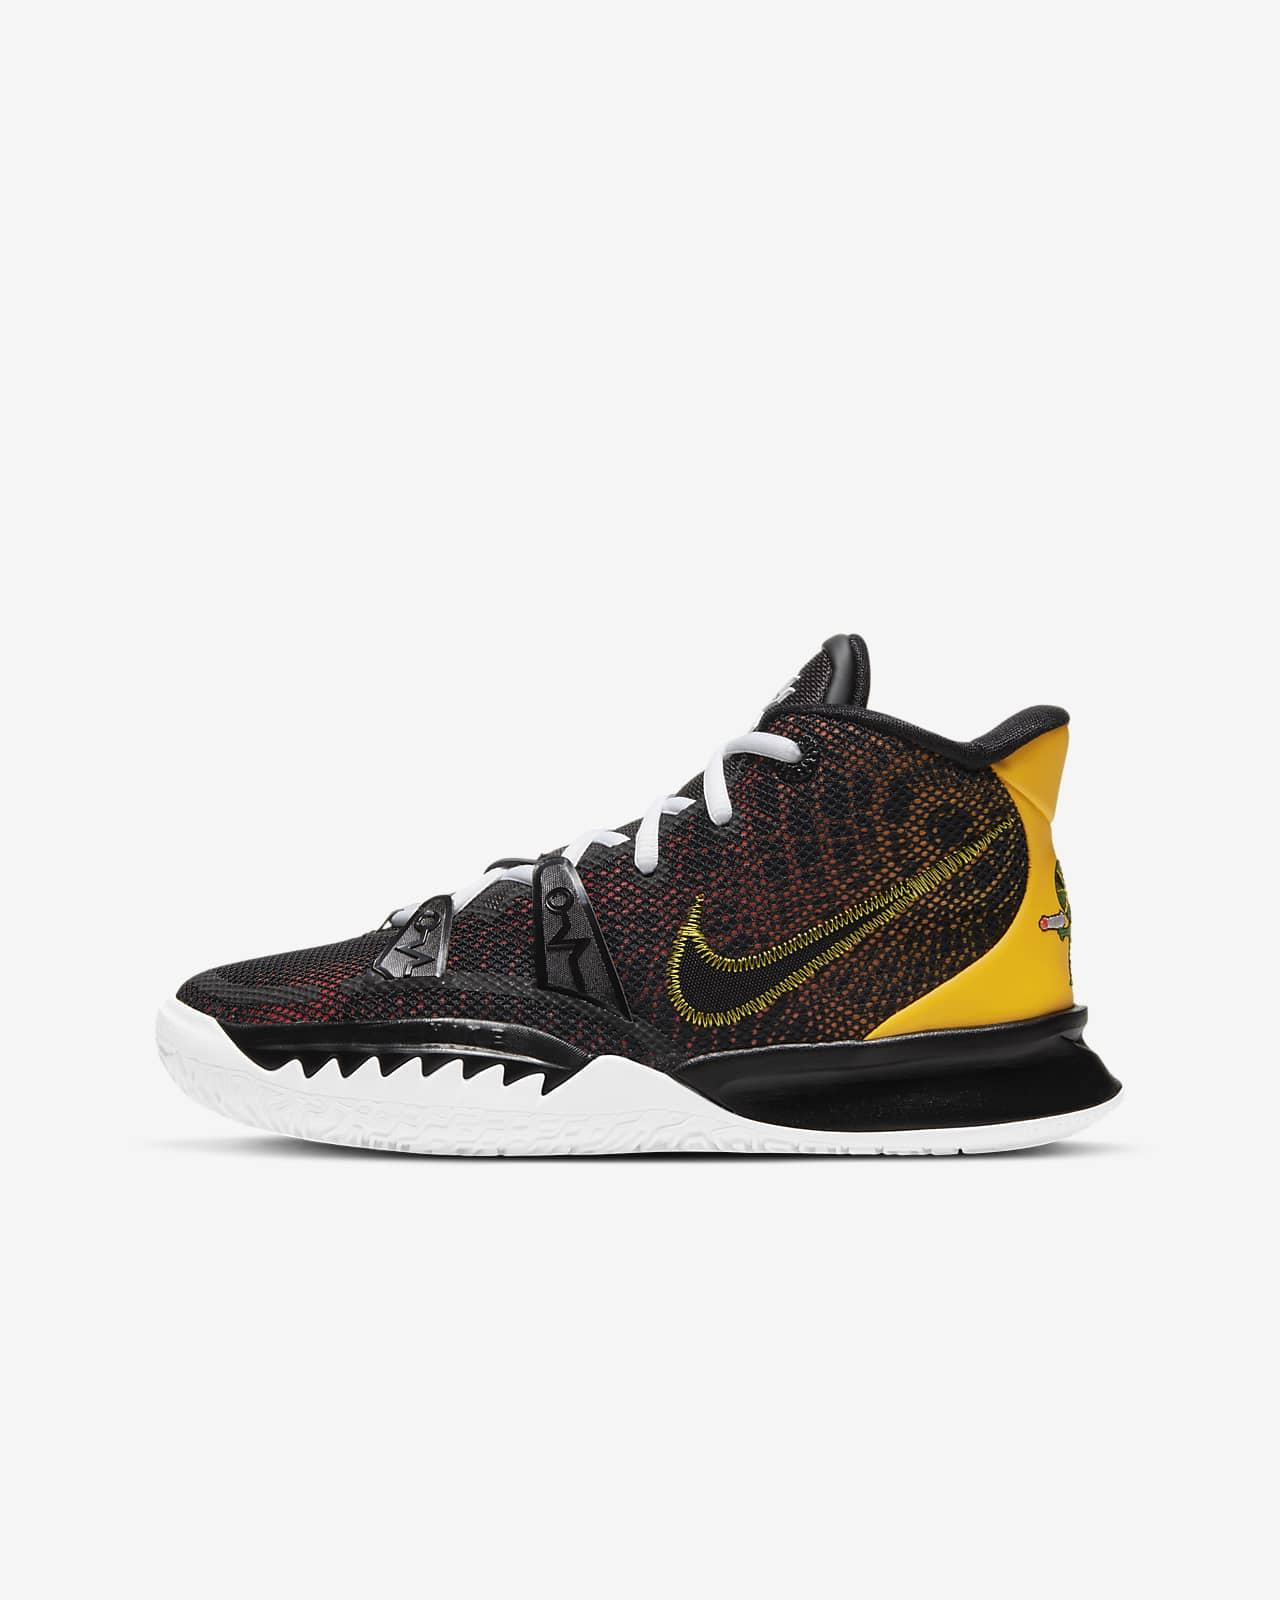 Kyrie 7 Older Kids' Basketball Shoe